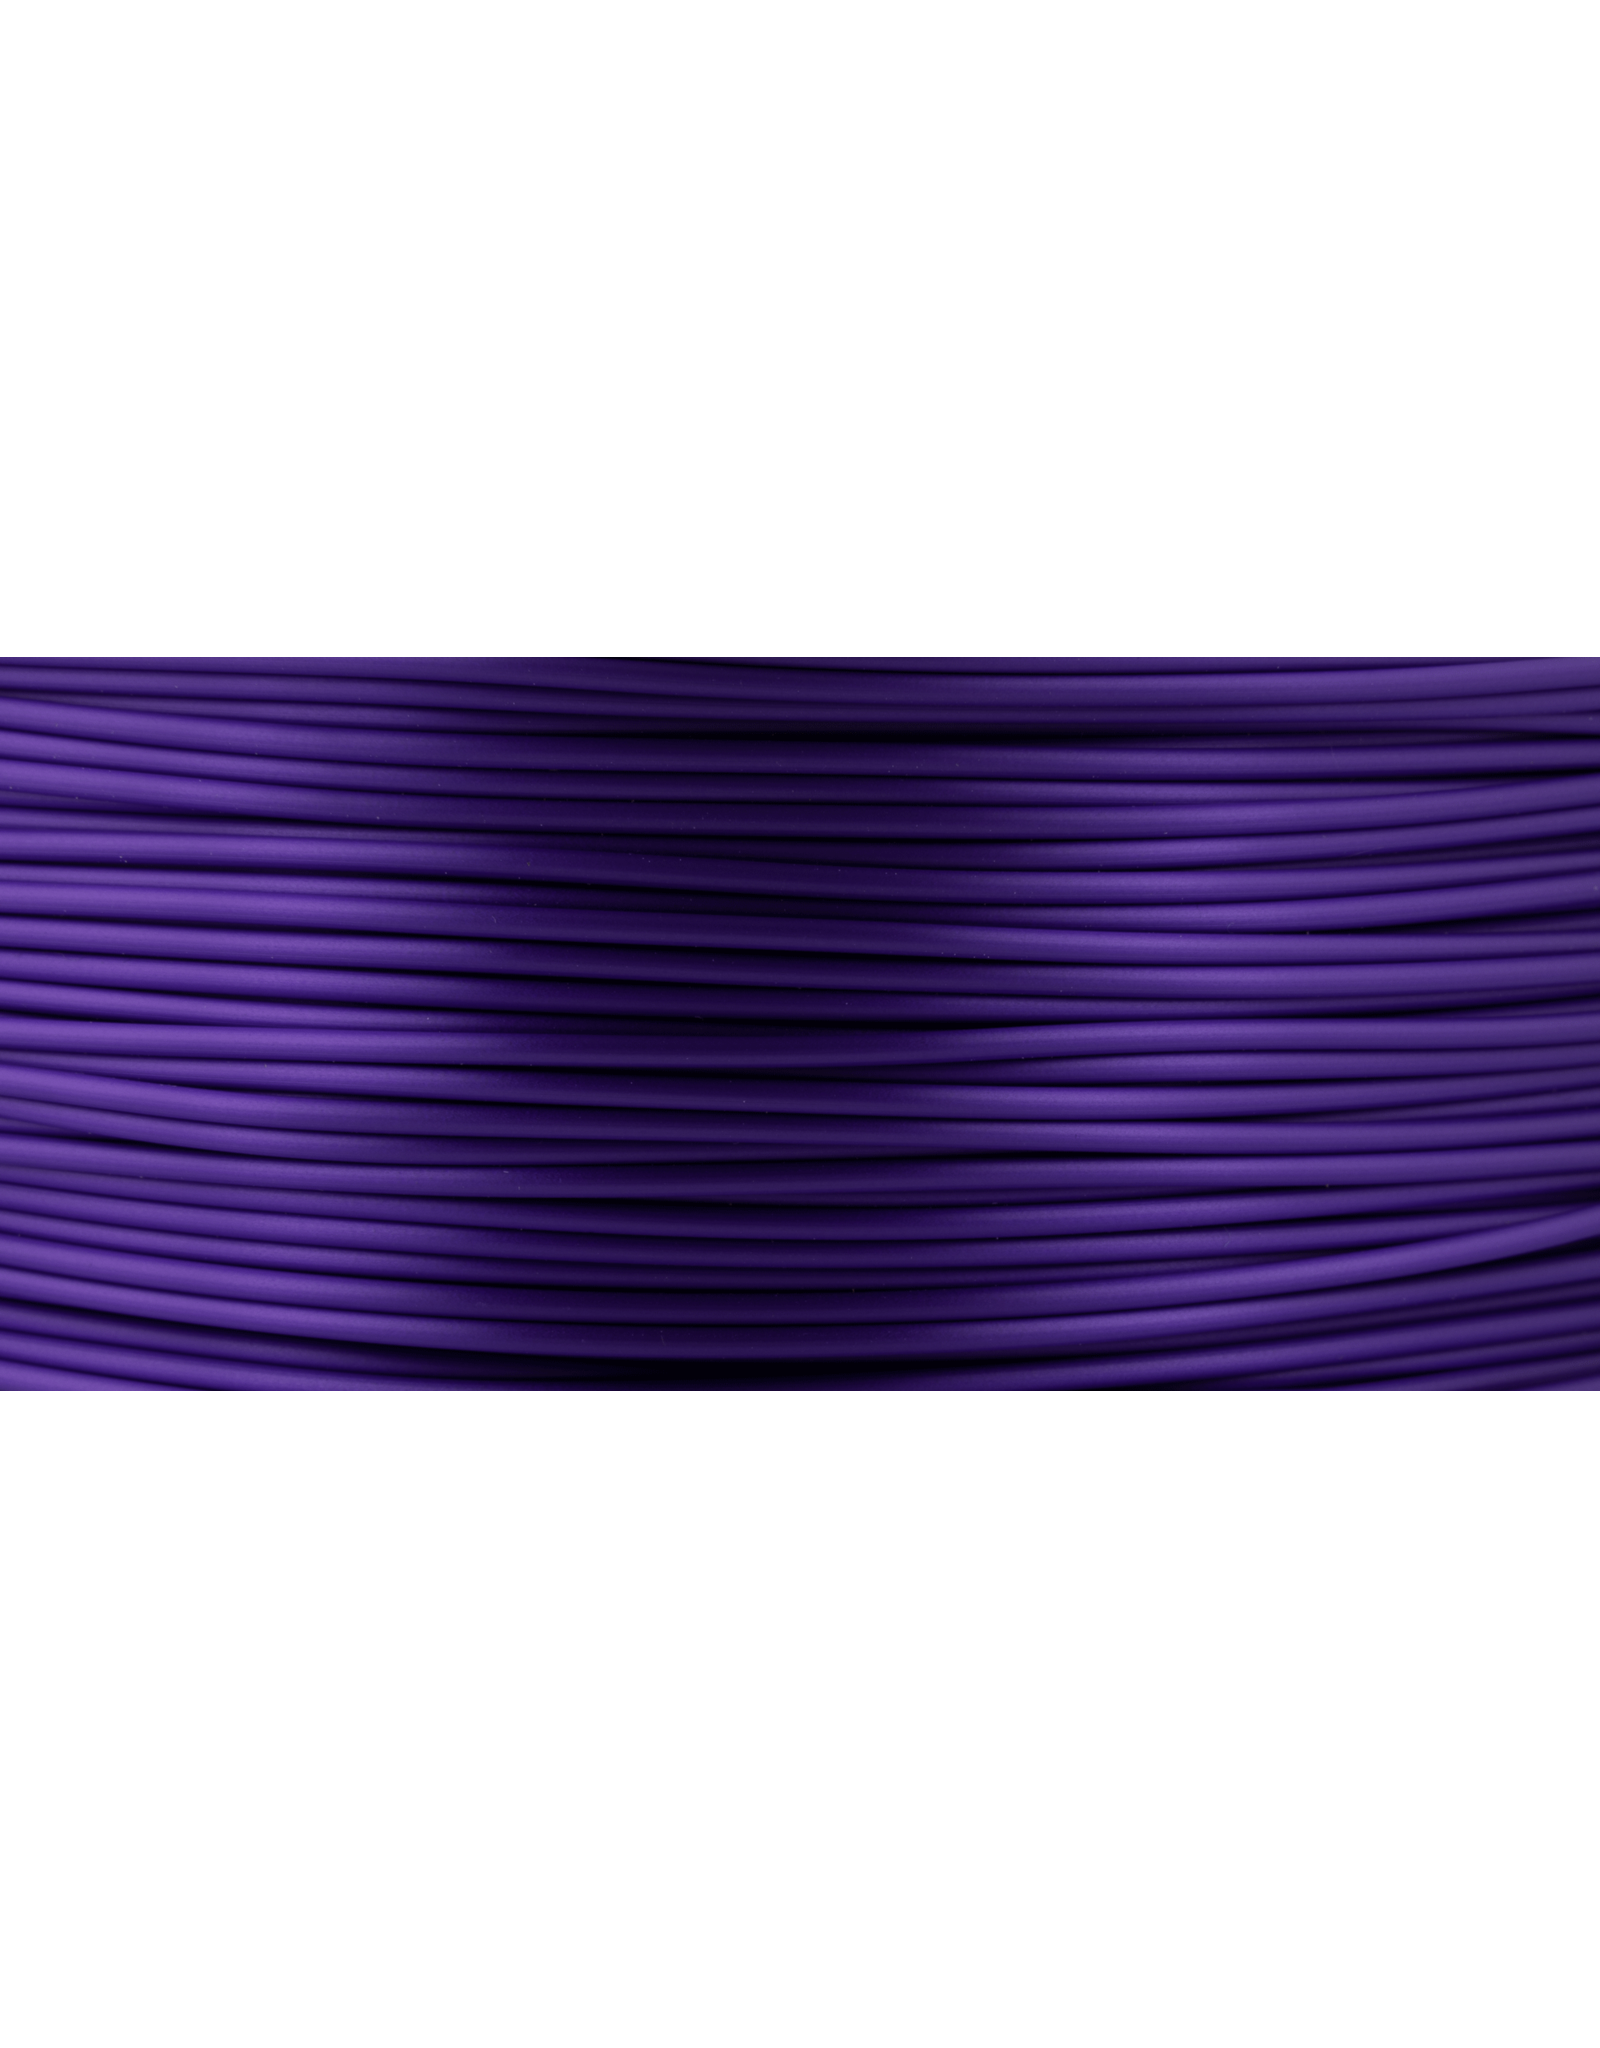 Prima PrimaSelect PLA Glossy - 1.75mm - 750 g  - Nebula Purple